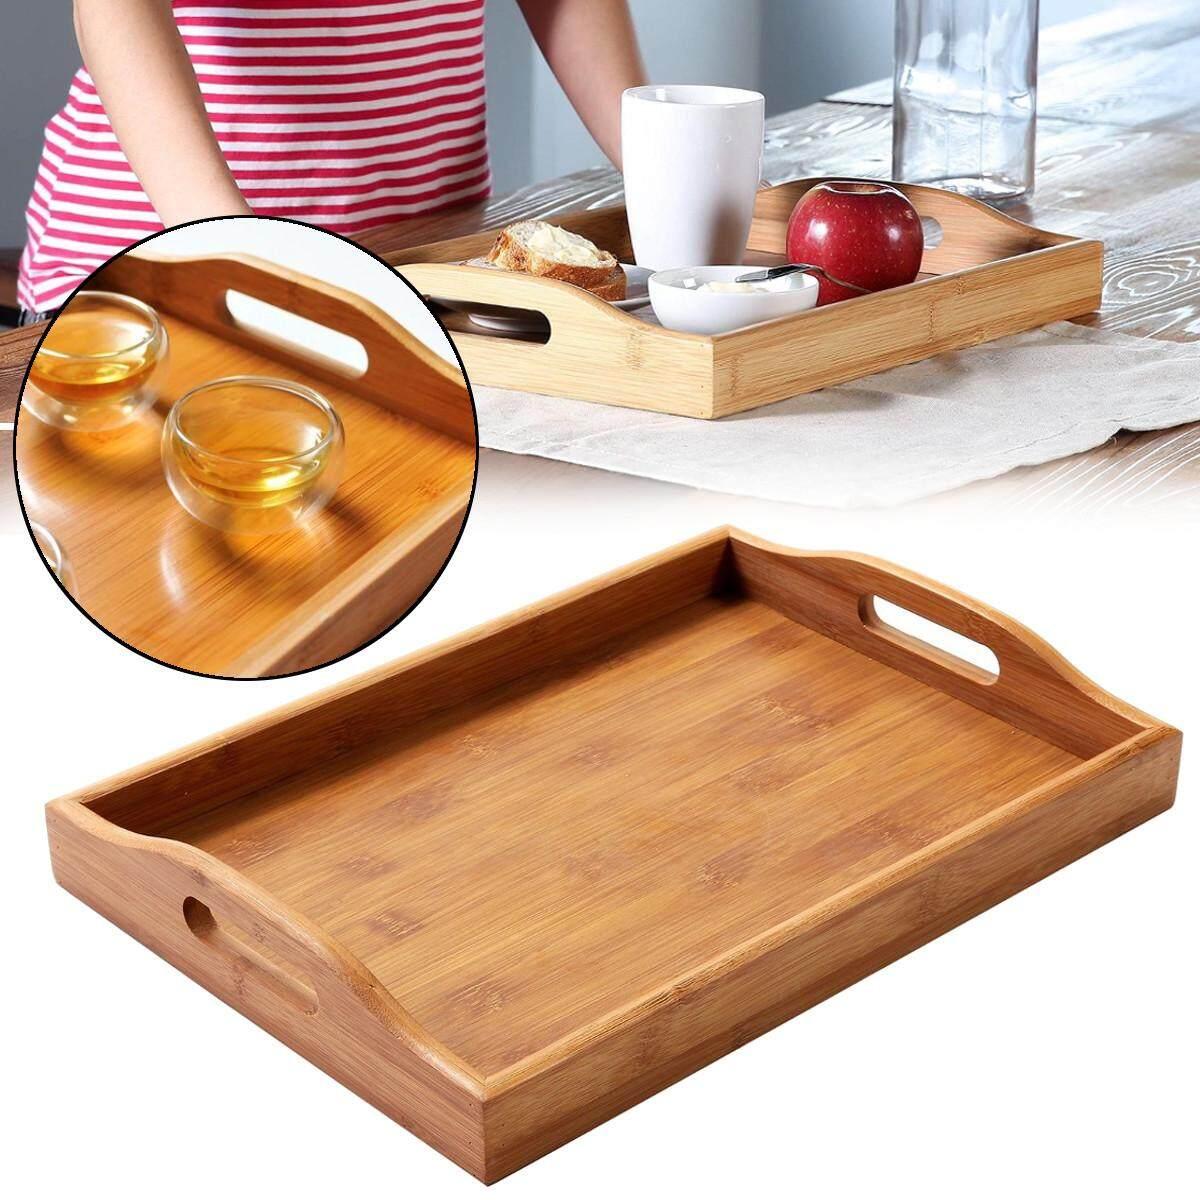 18cm Round Wooden Serving Tray for Fruit Tea Breakfast Wood Kitchen Platter